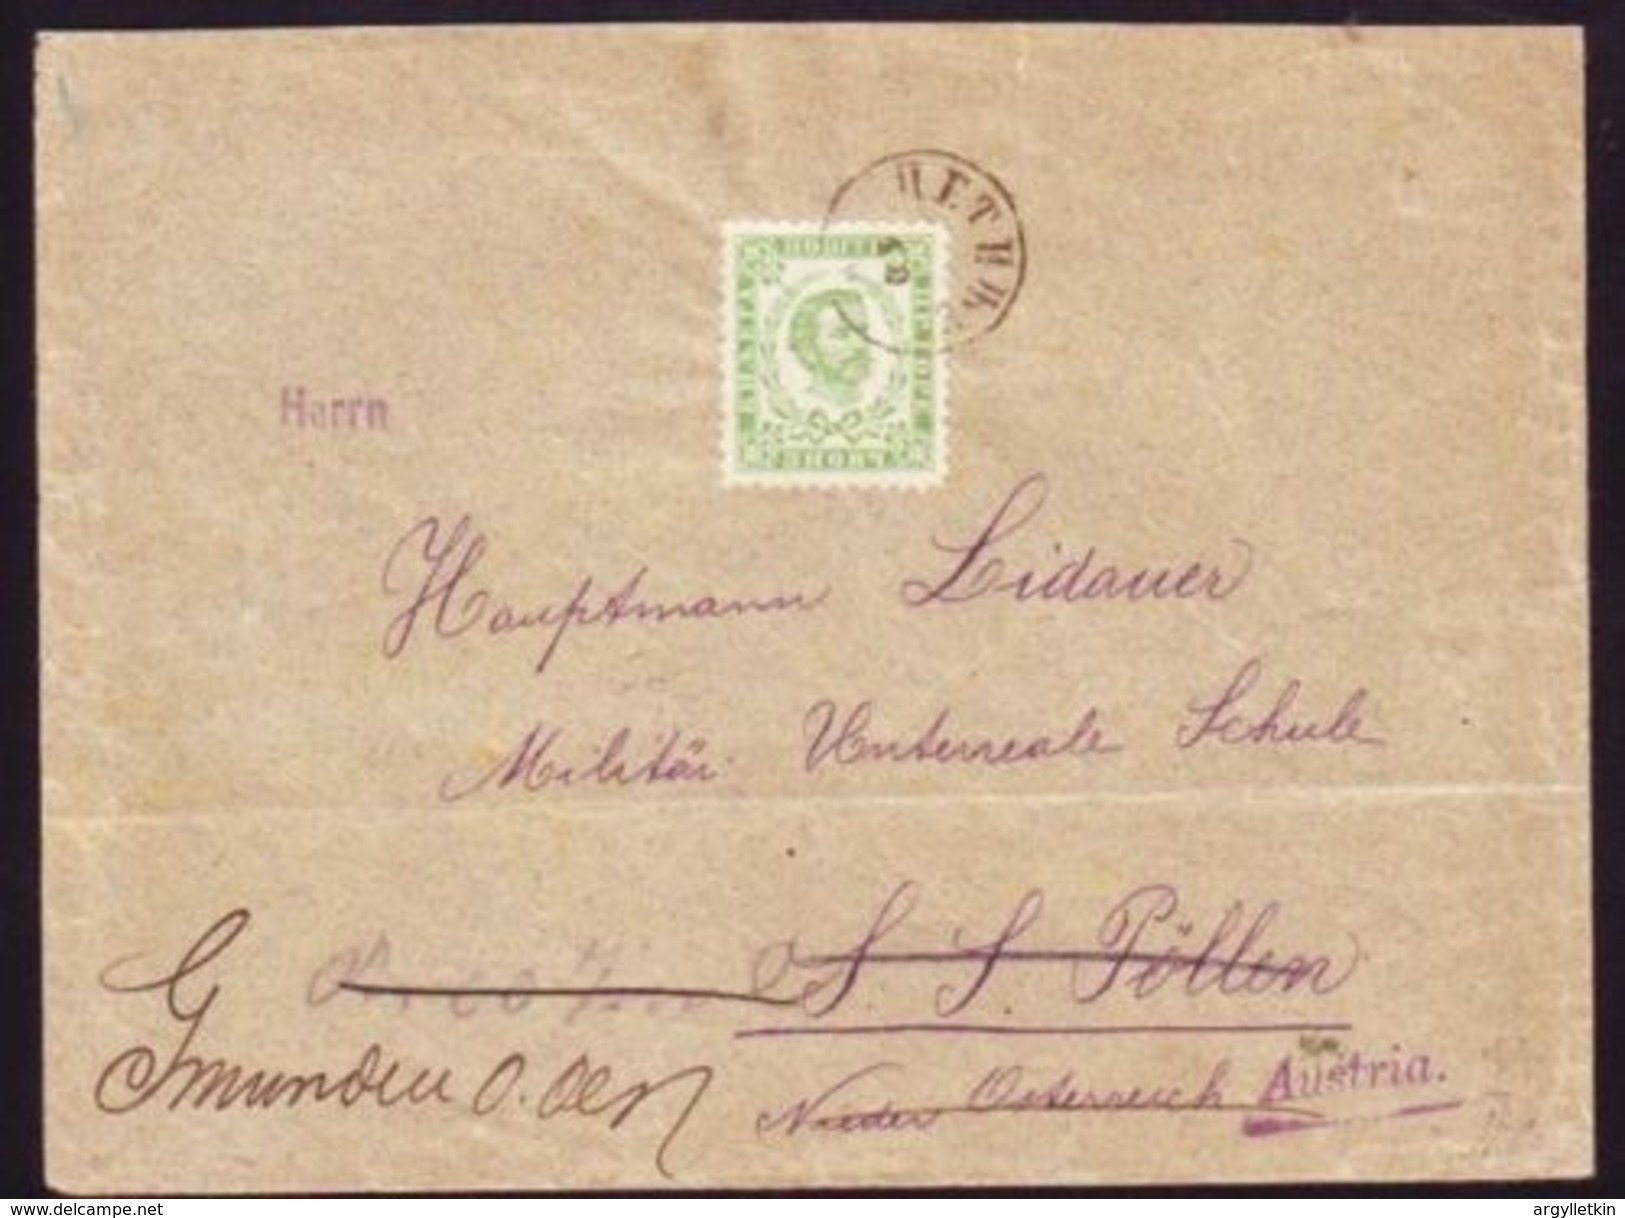 MONTENEGRO 1895 COVER TO AUSTRIA - Montenegro